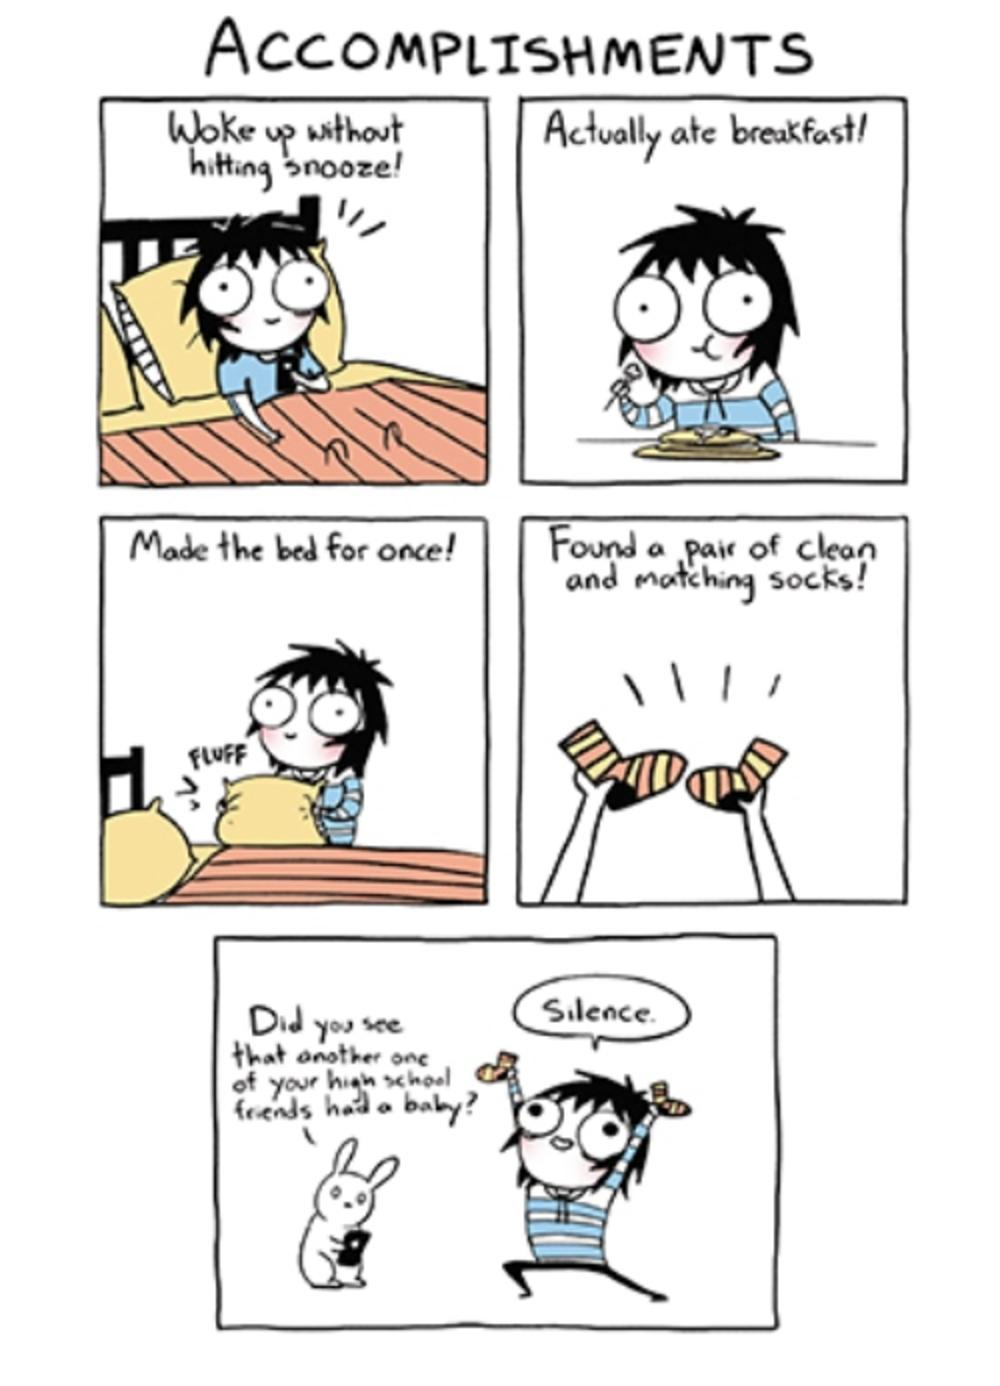 Accomplishments Sarah Scribbles Funny Birthday Greeting Card